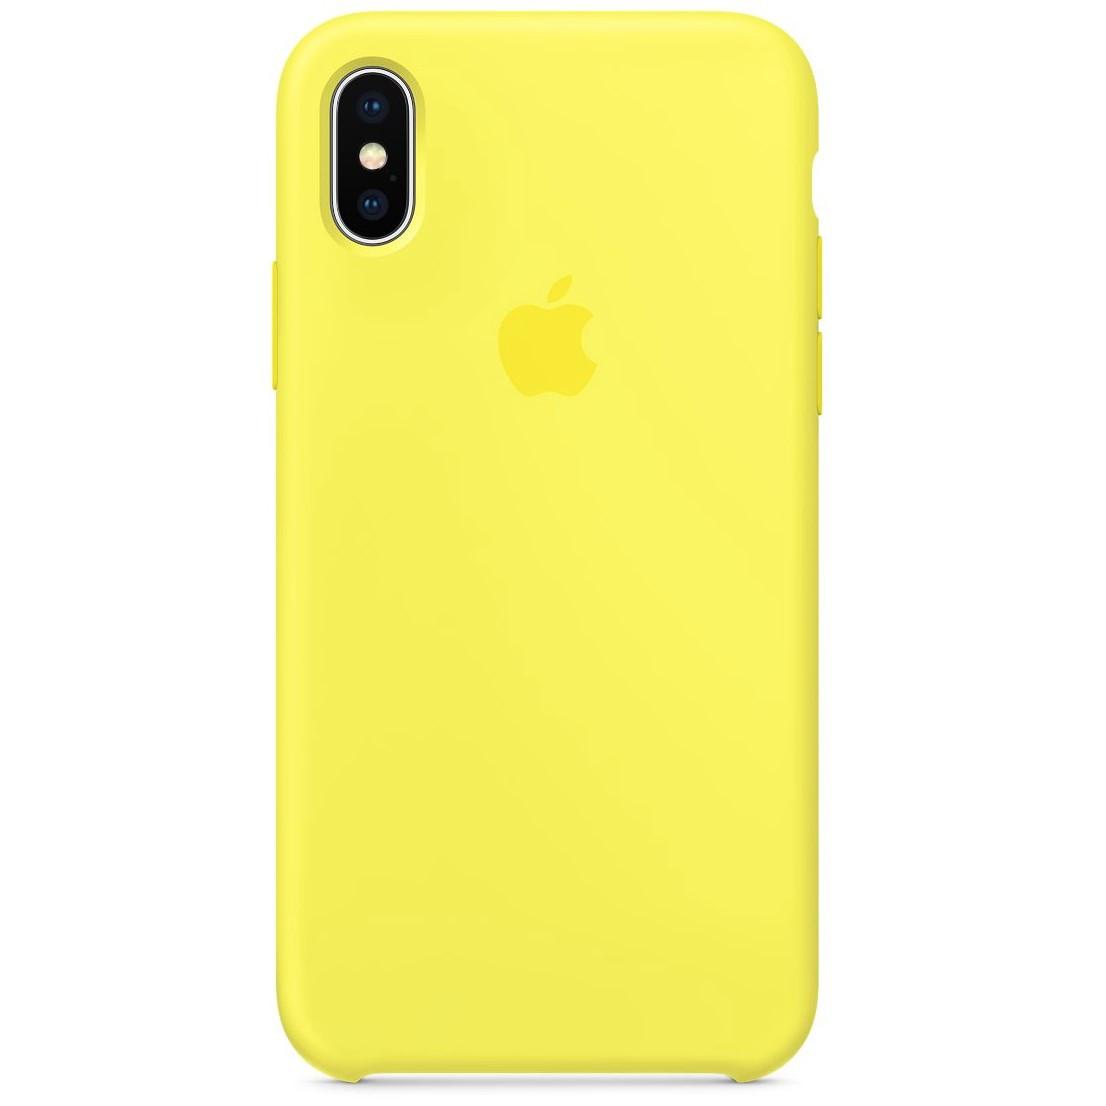 Чехол накладка xCase для iPhone XS Max Silicone Case лимонный